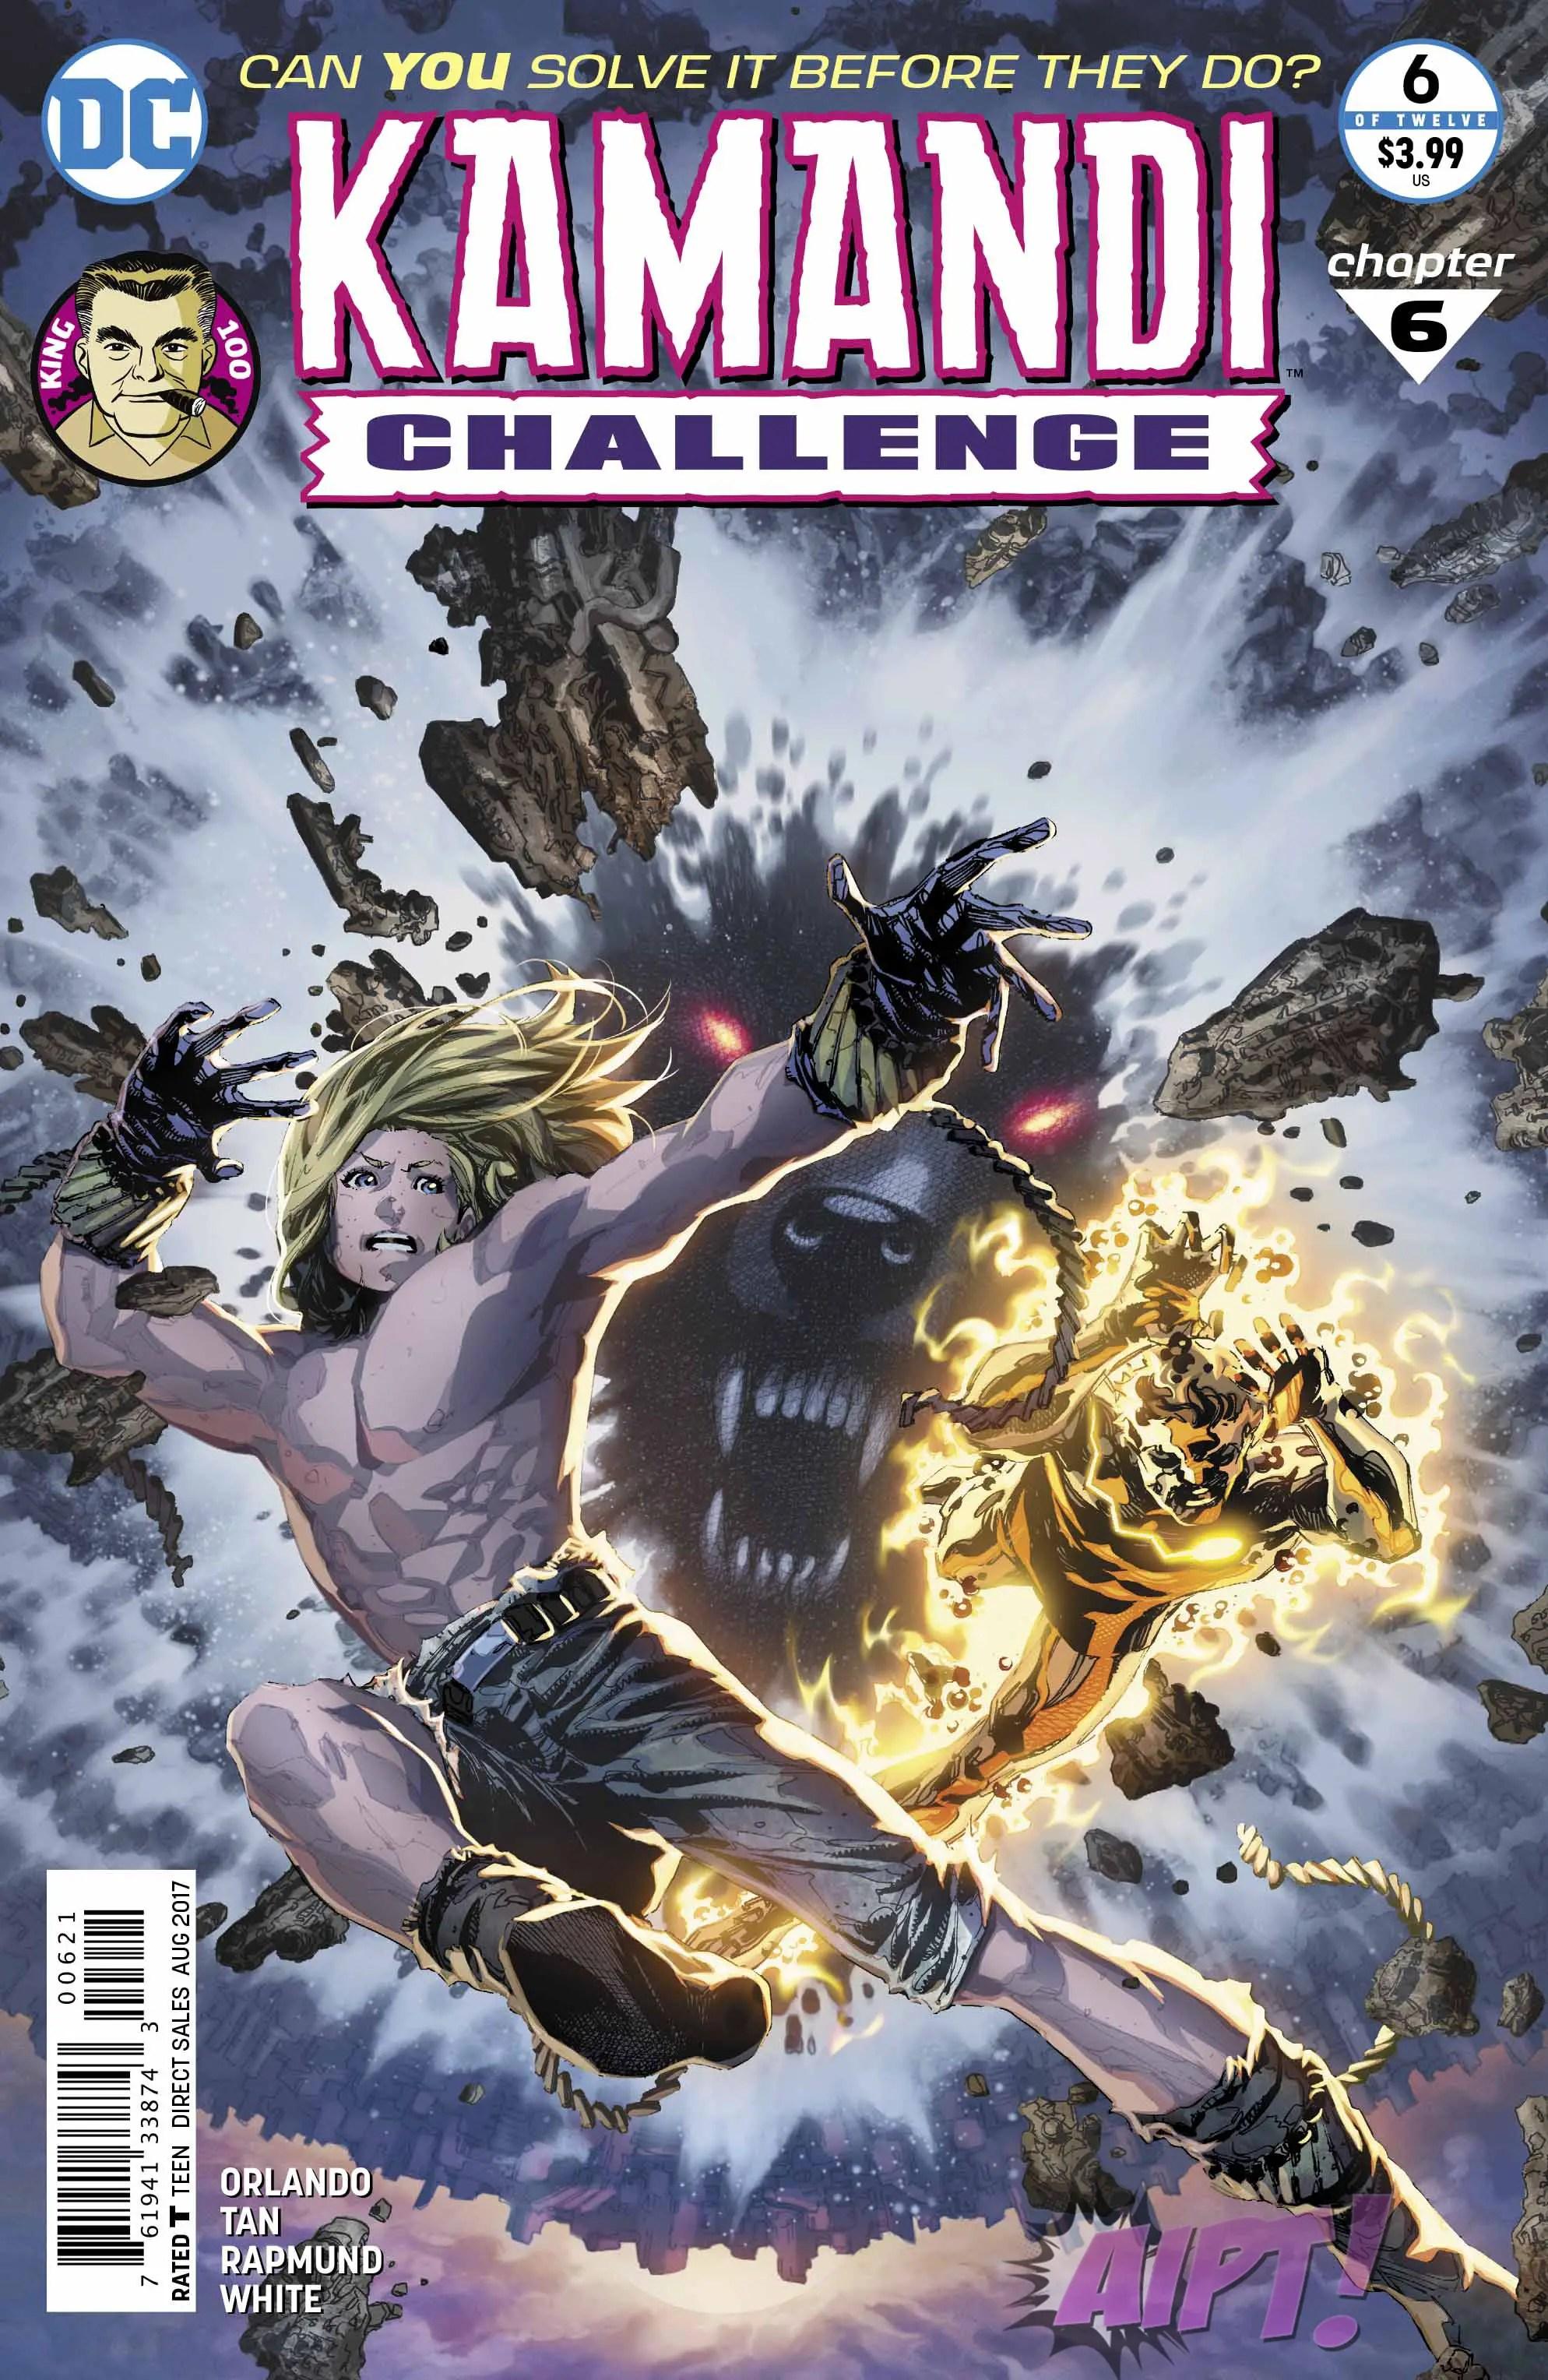 Kamandi Challenge #6 Review